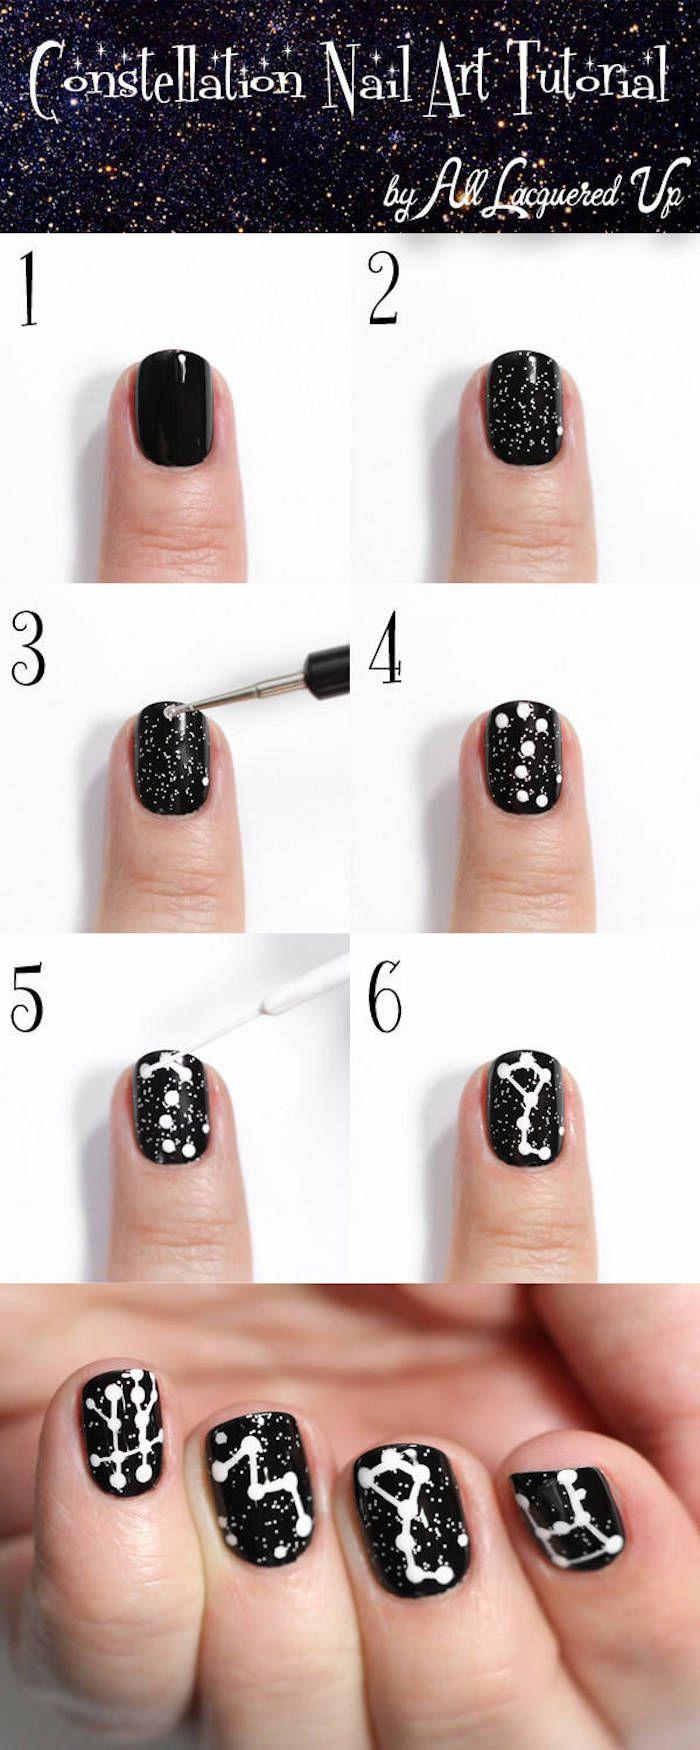 nailart bilder, weltall nageldesign selber machen, diy | Nails ...